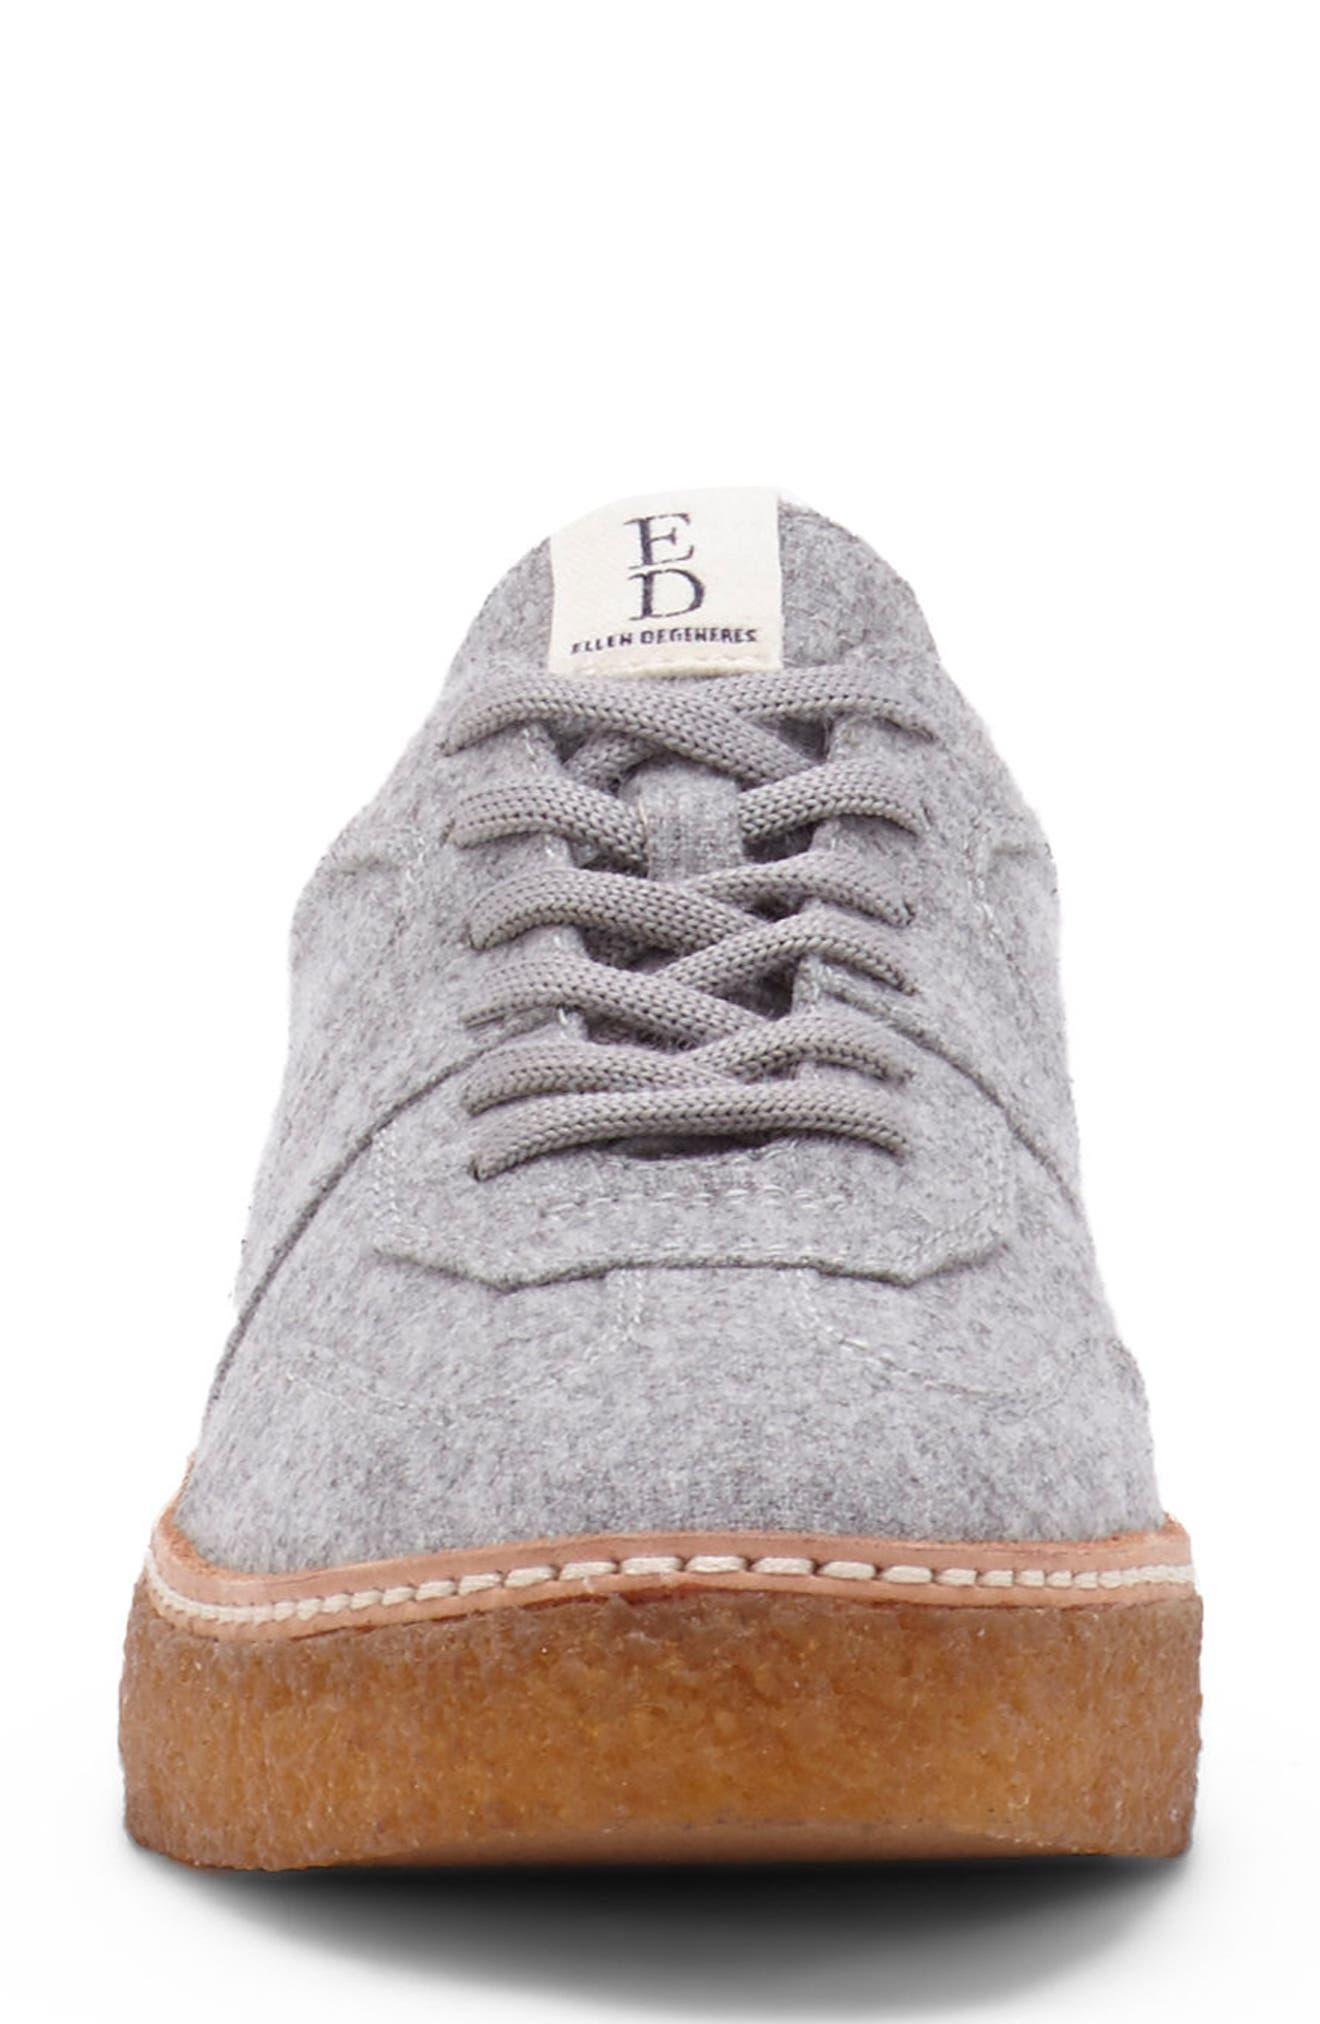 Danby Sneaker,                             Alternate thumbnail 3, color,                             022